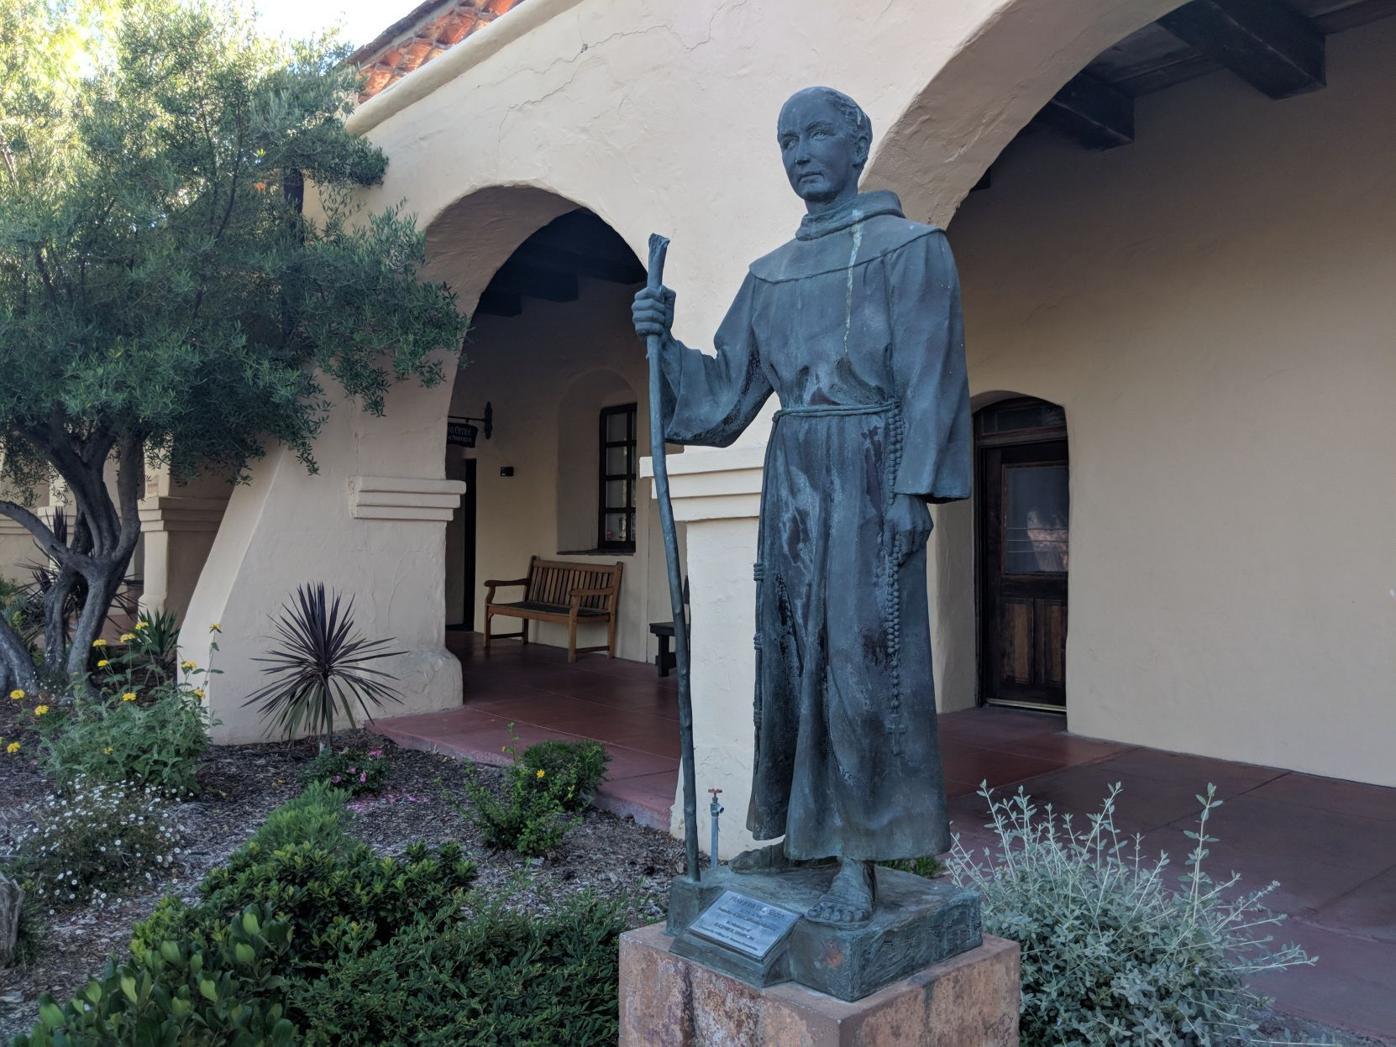 072620 Junipero Serra Statue - 1